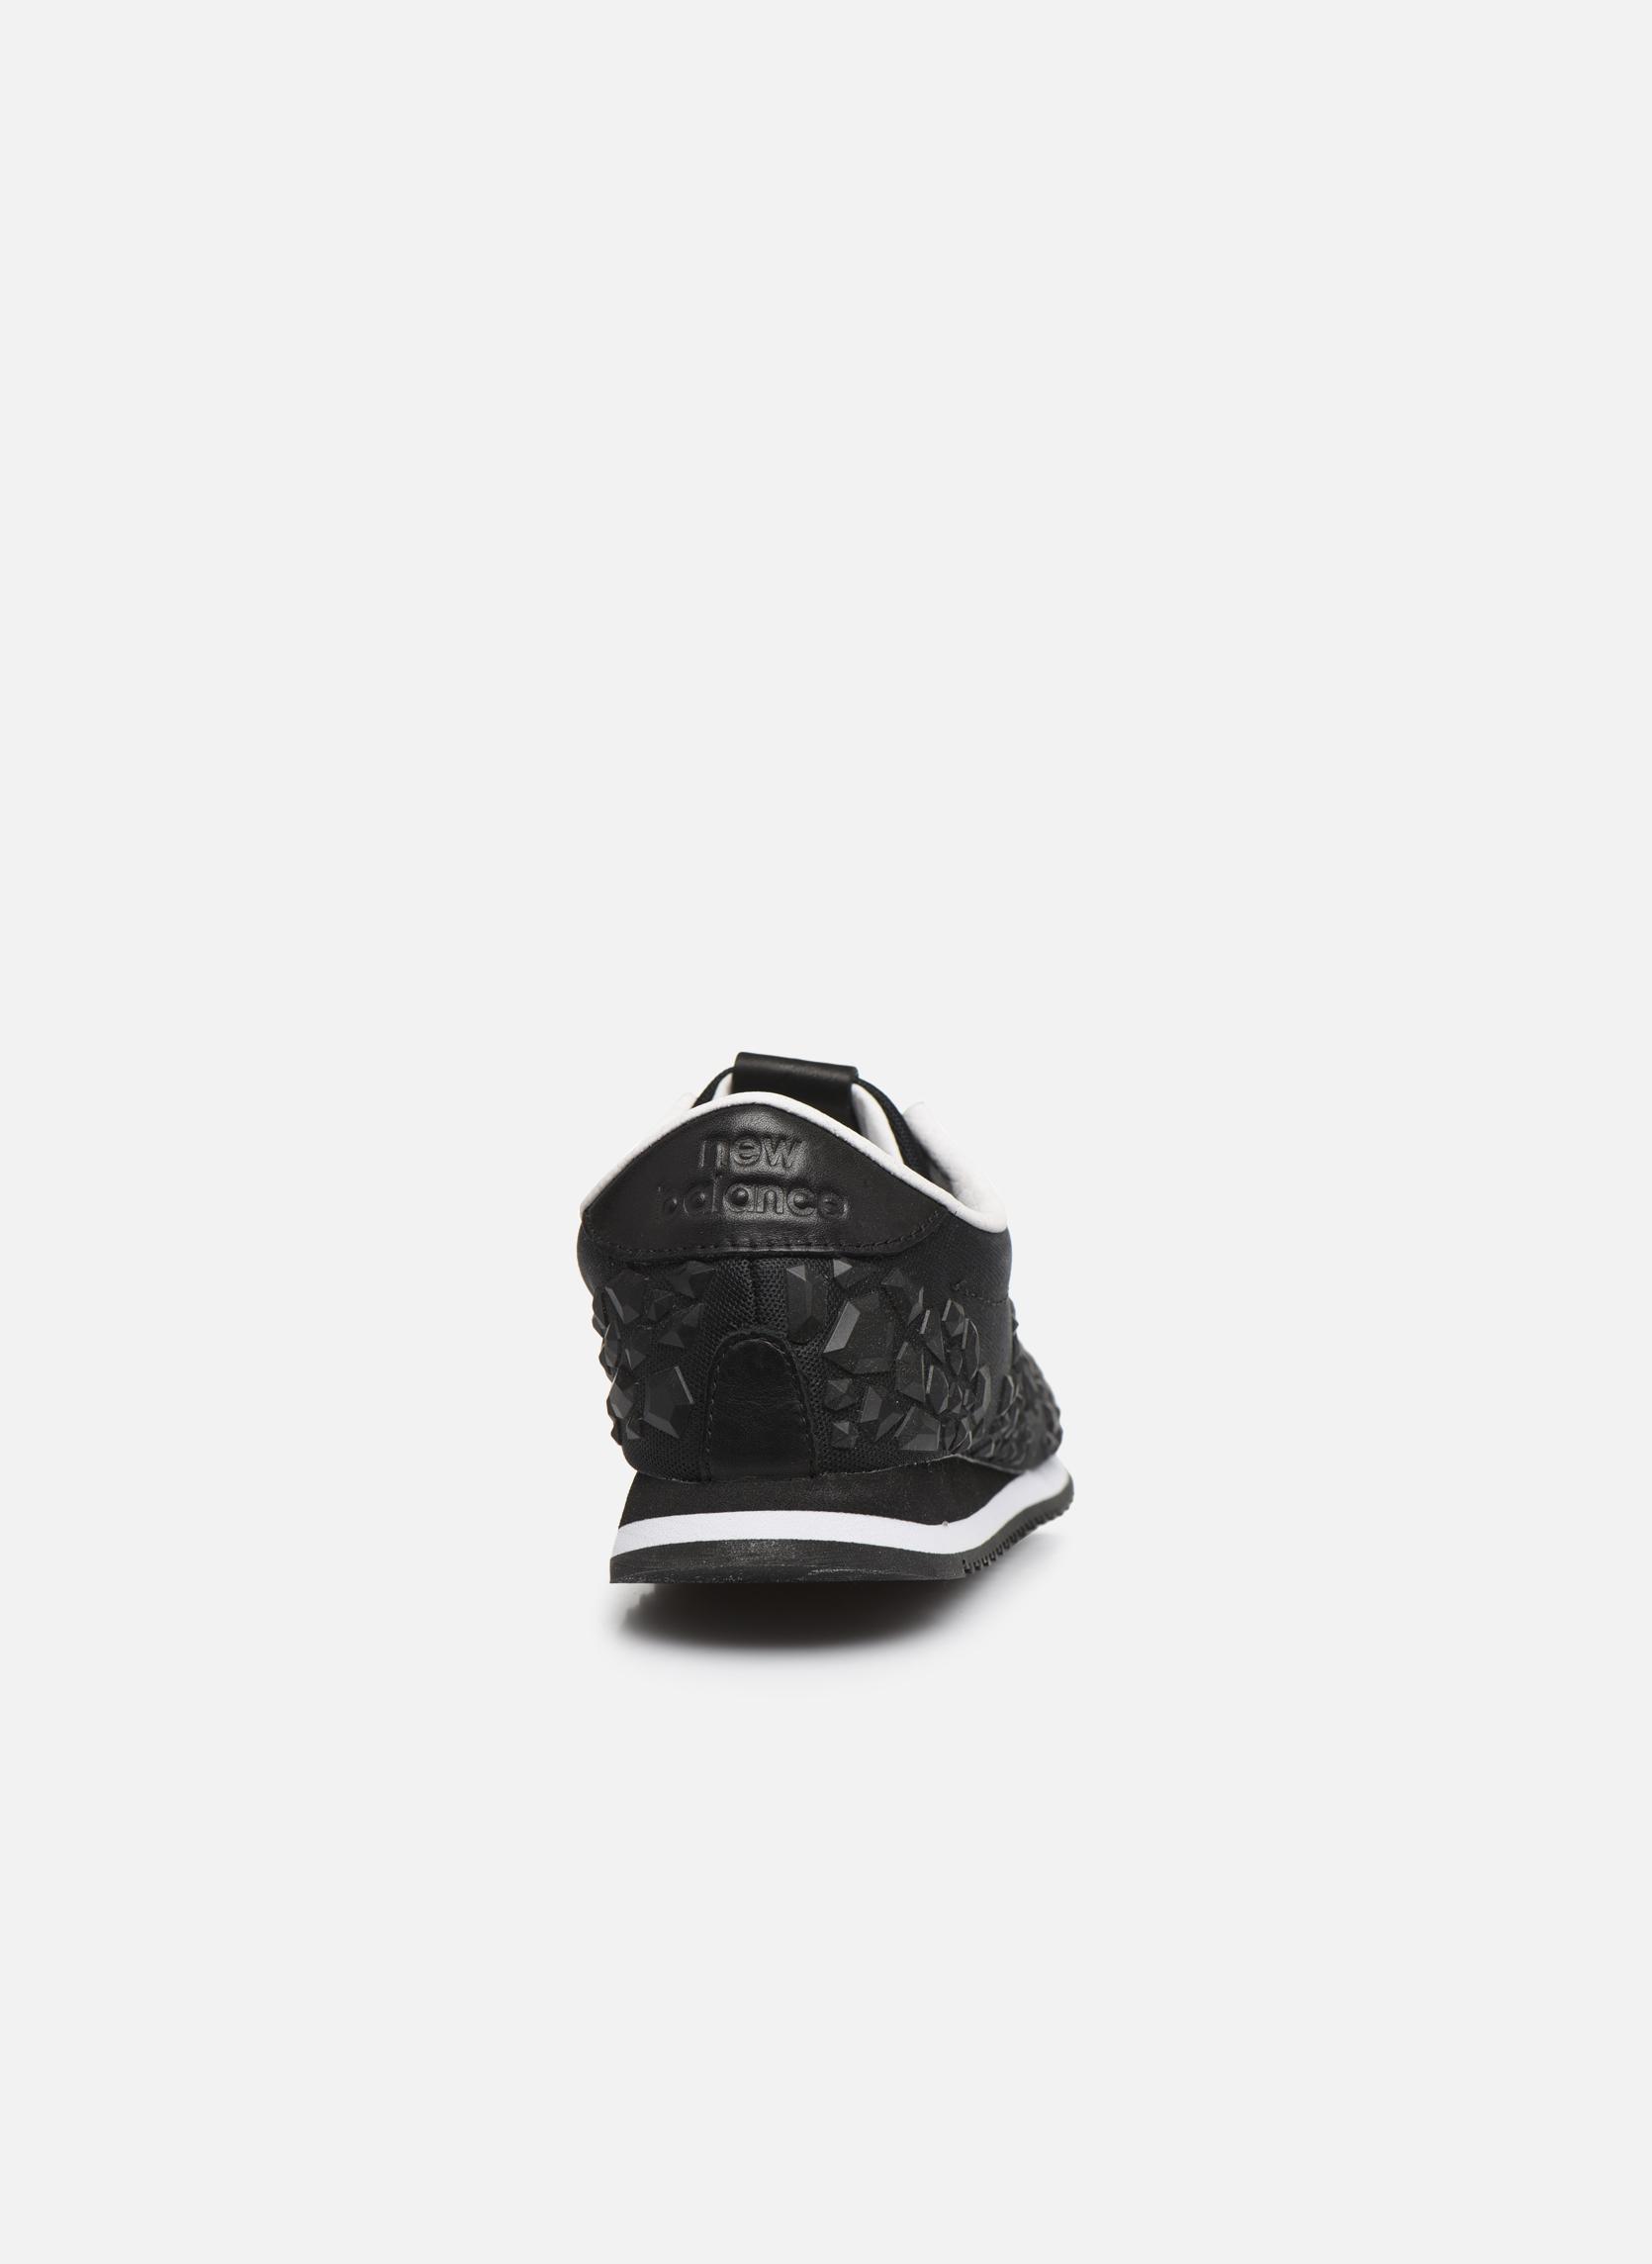 KIC Black/Poolside New Balance WL420 (Noir)